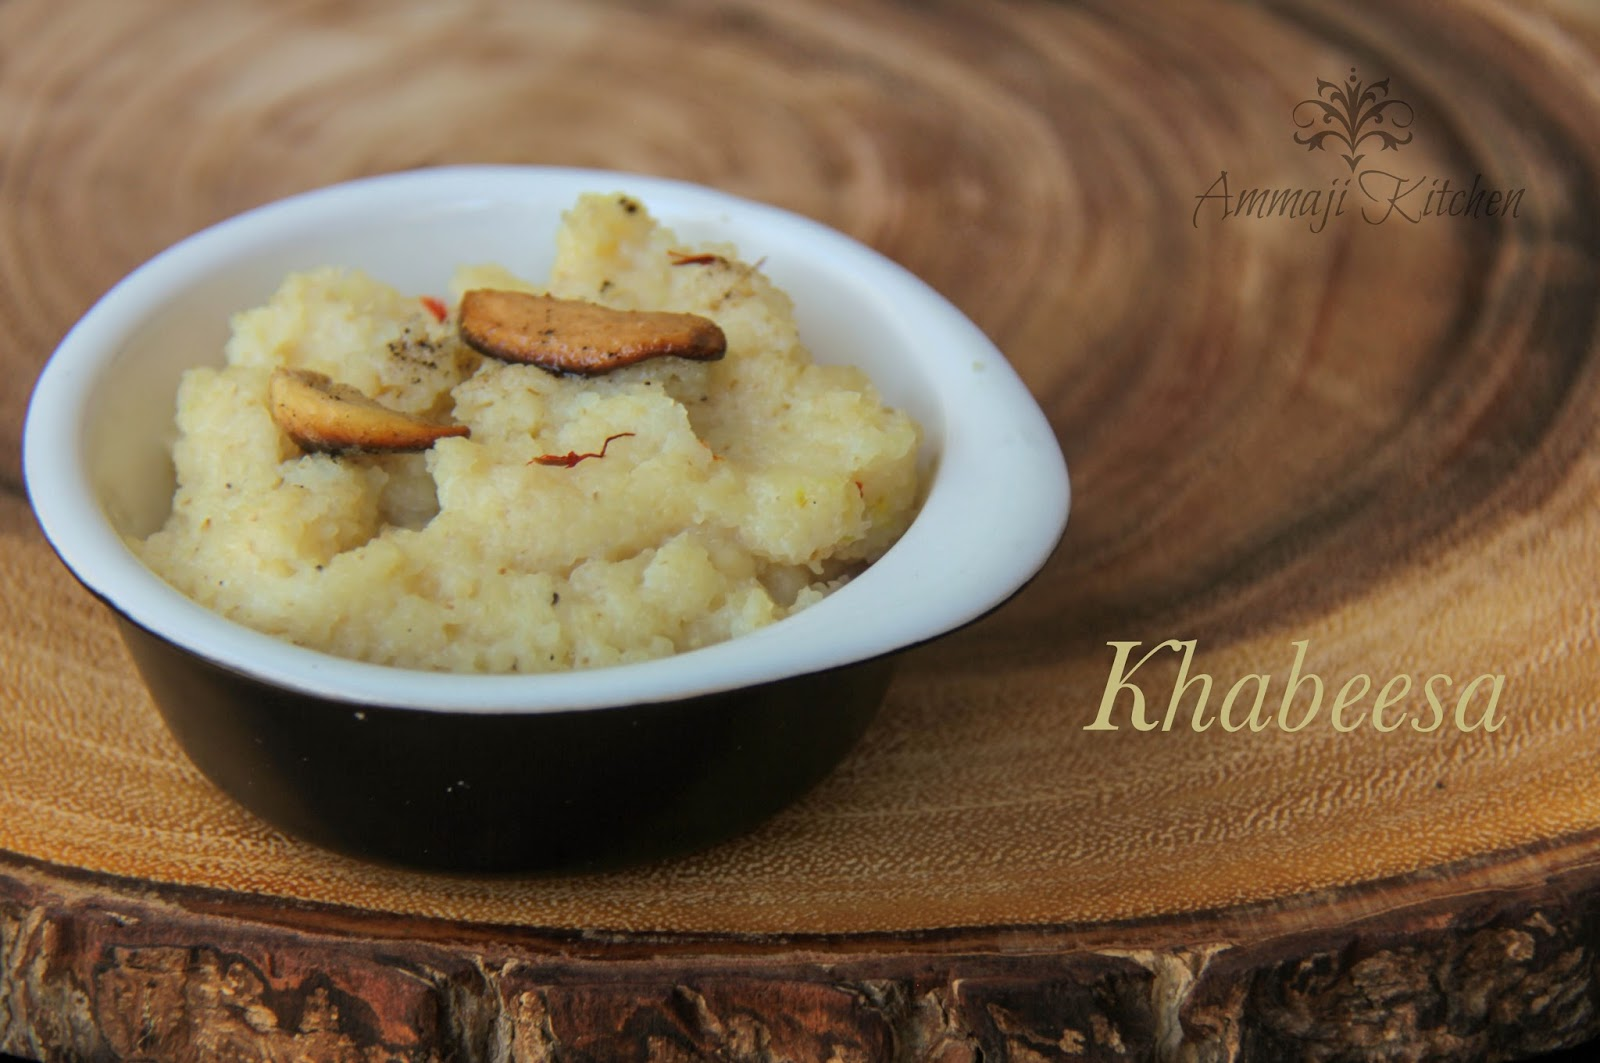 Khabeesa